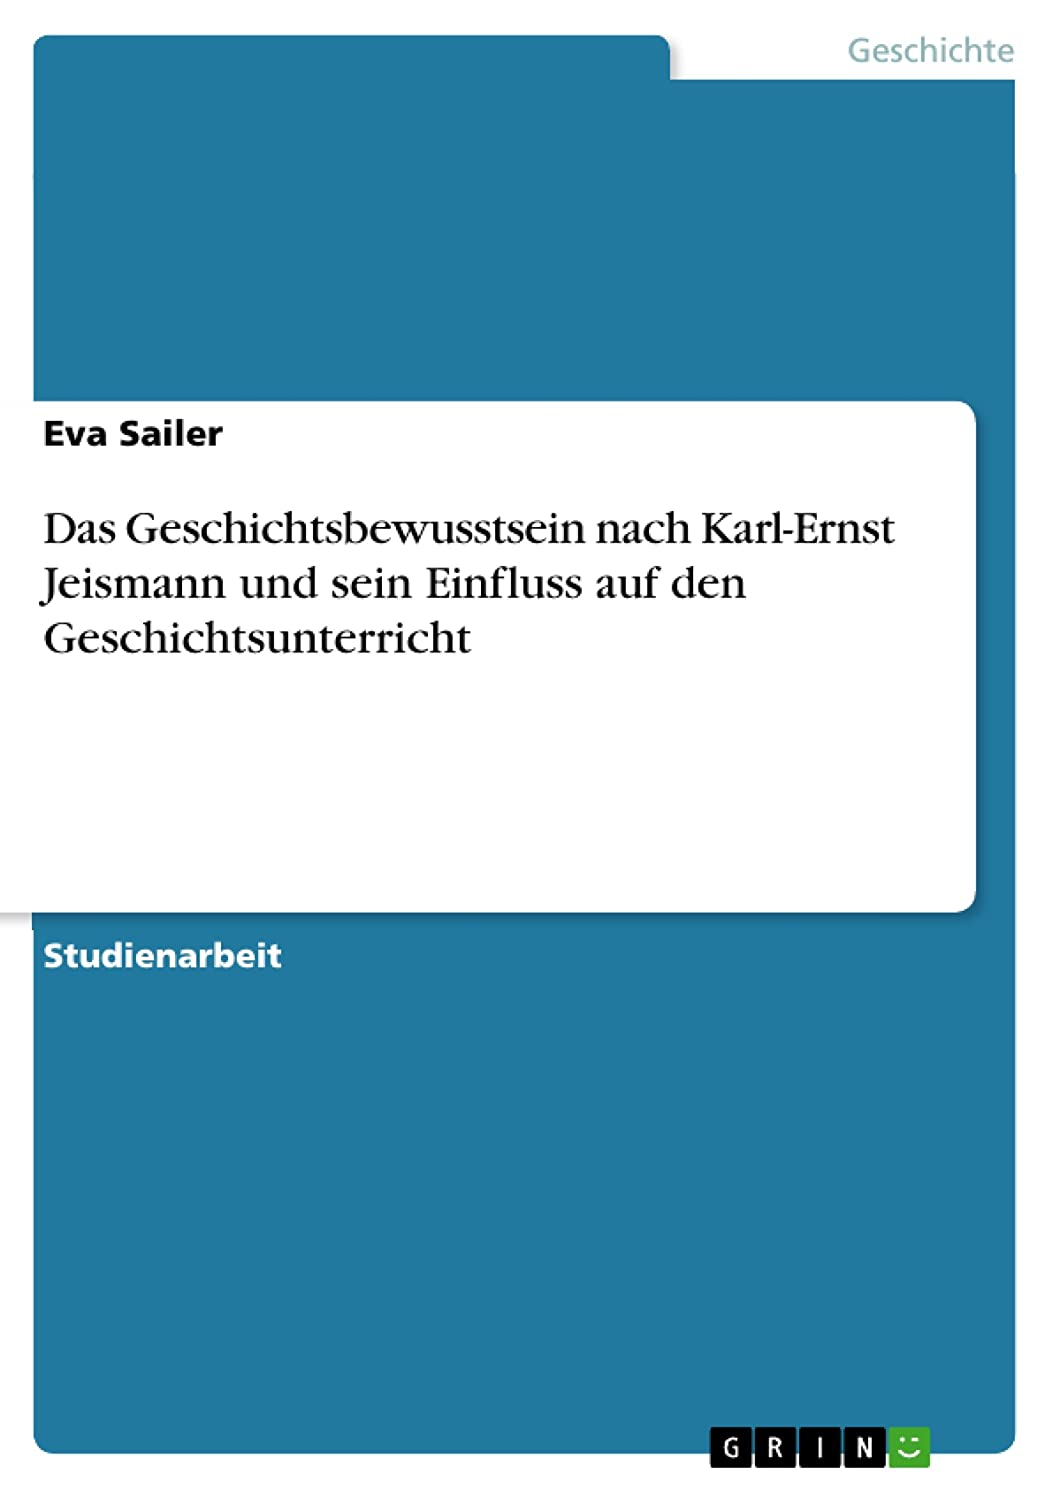 切り離す減衰たらいDas Geschichtsbewusstsein nach Karl-Ernst Jeismann und sein Einfluss auf den Geschichtsunterricht (German Edition)